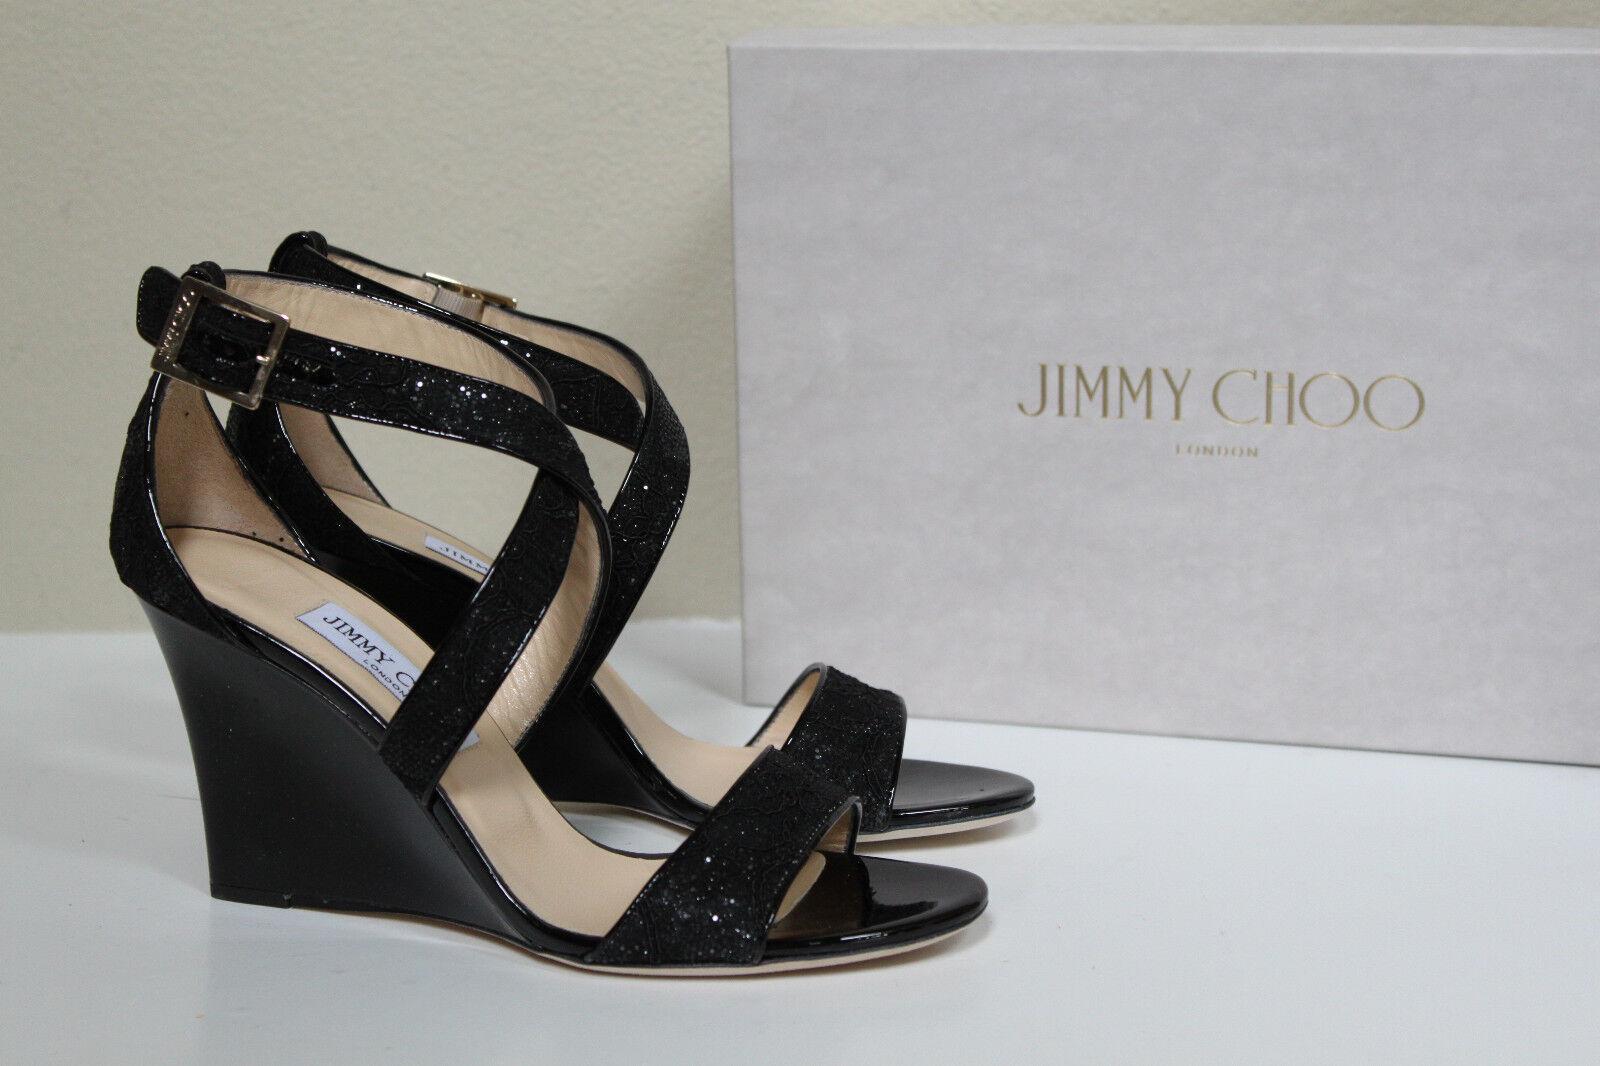 Talla 9 39 Jimmy Choo Fearne Fearne Fearne Brillo Encaje Negro Sandalia Peep Toe Zapato Cuña de patente  venta caliente